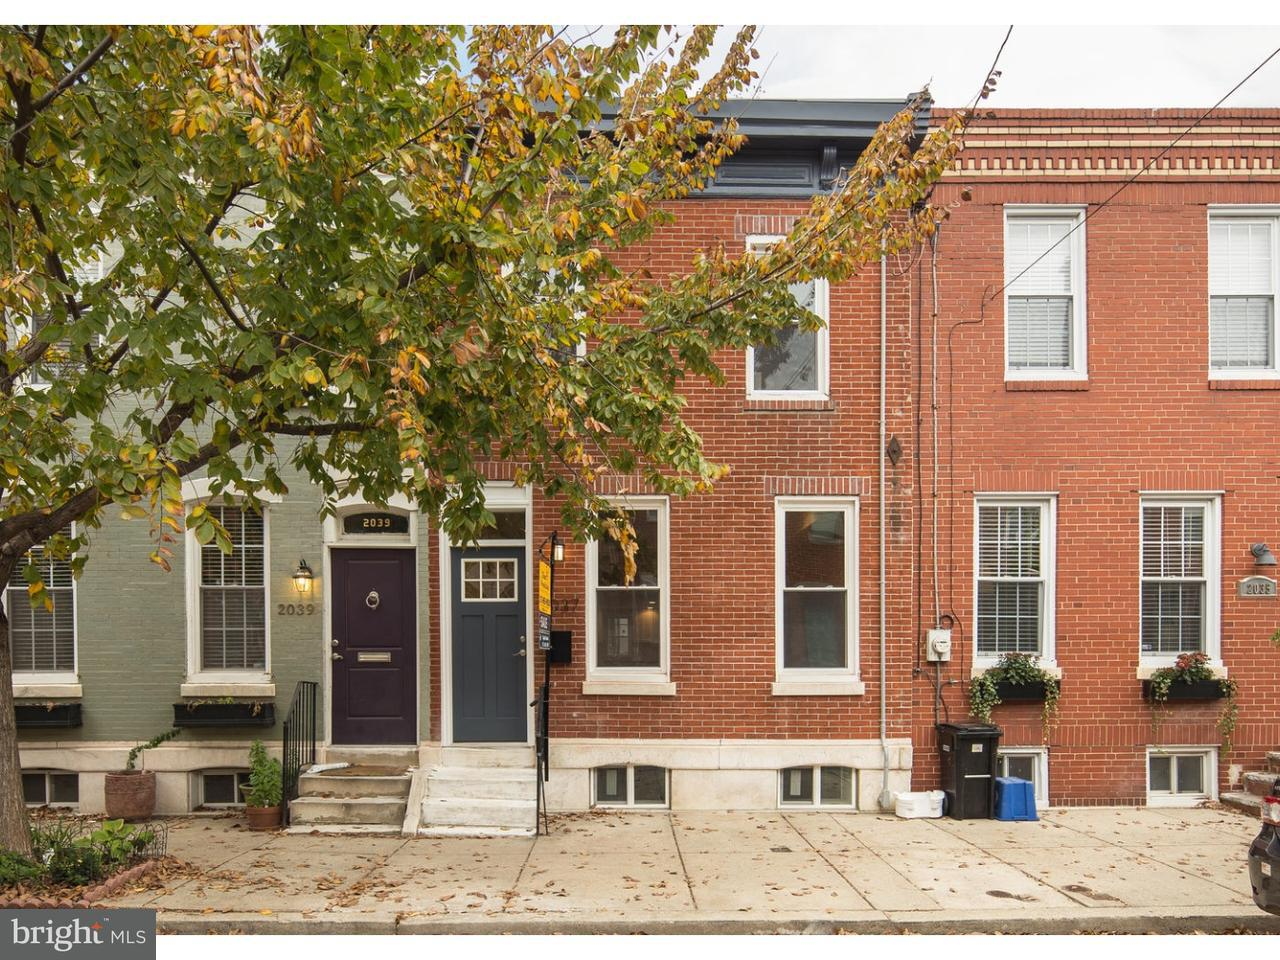 2037  Carpenter Philadelphia, PA 19146